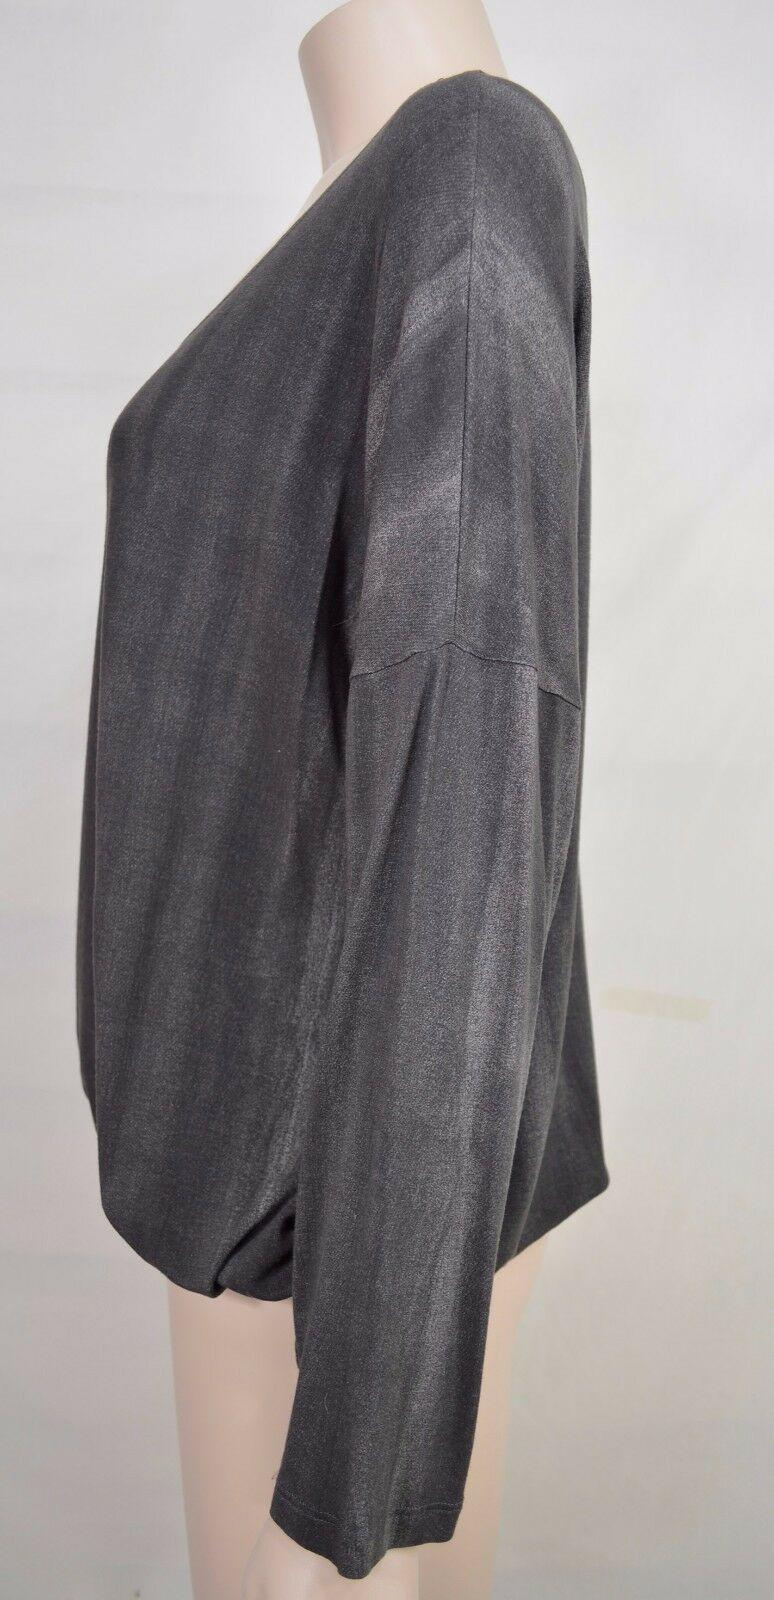 Matti Mamane top SZ M NWT dark gray drawstring waist scoop neck 3/4 sleeve new image 3